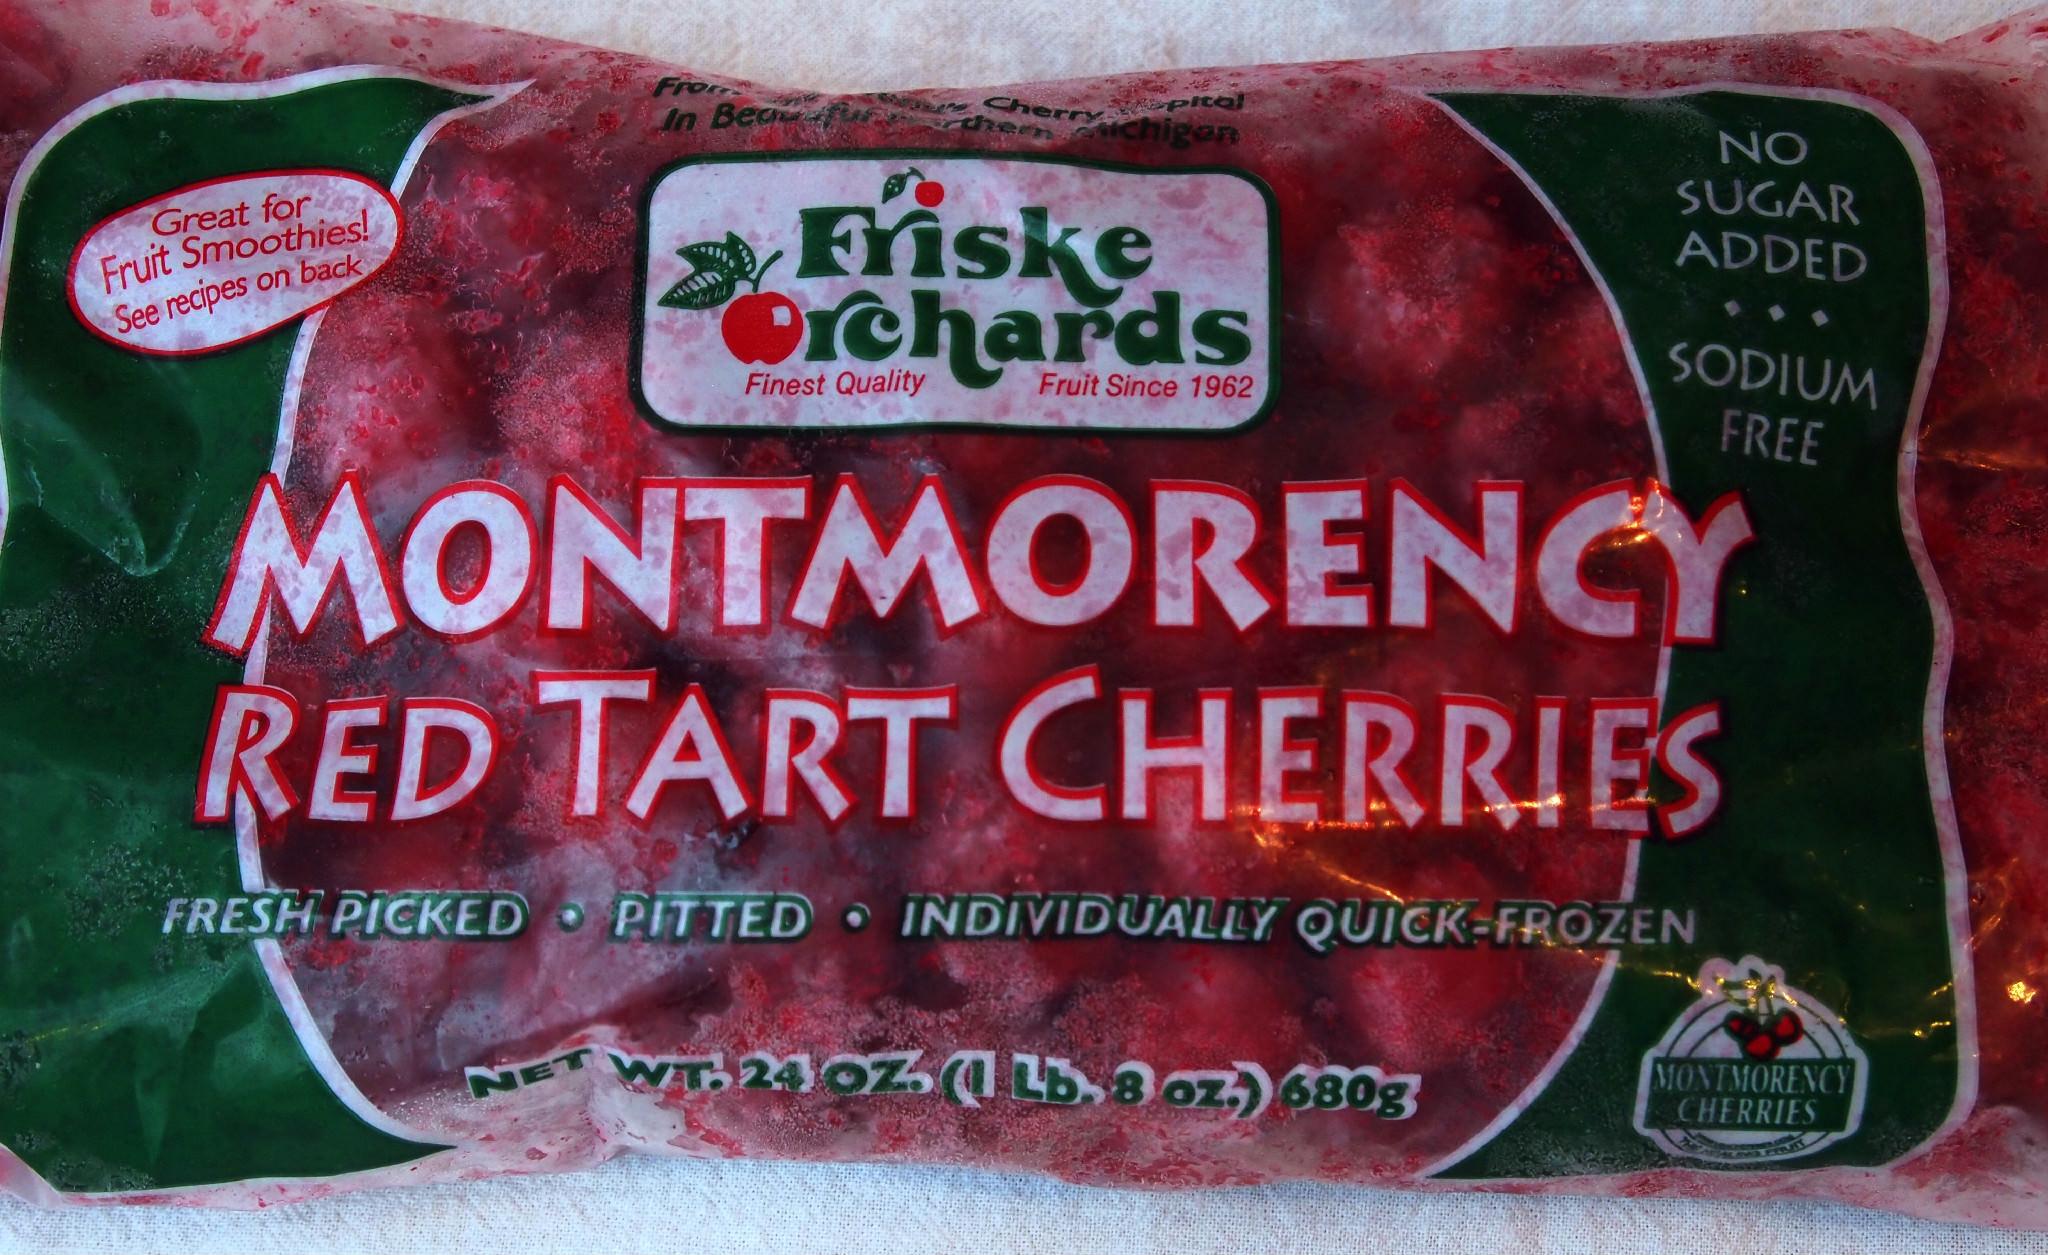 Friske's cherries ROCK!